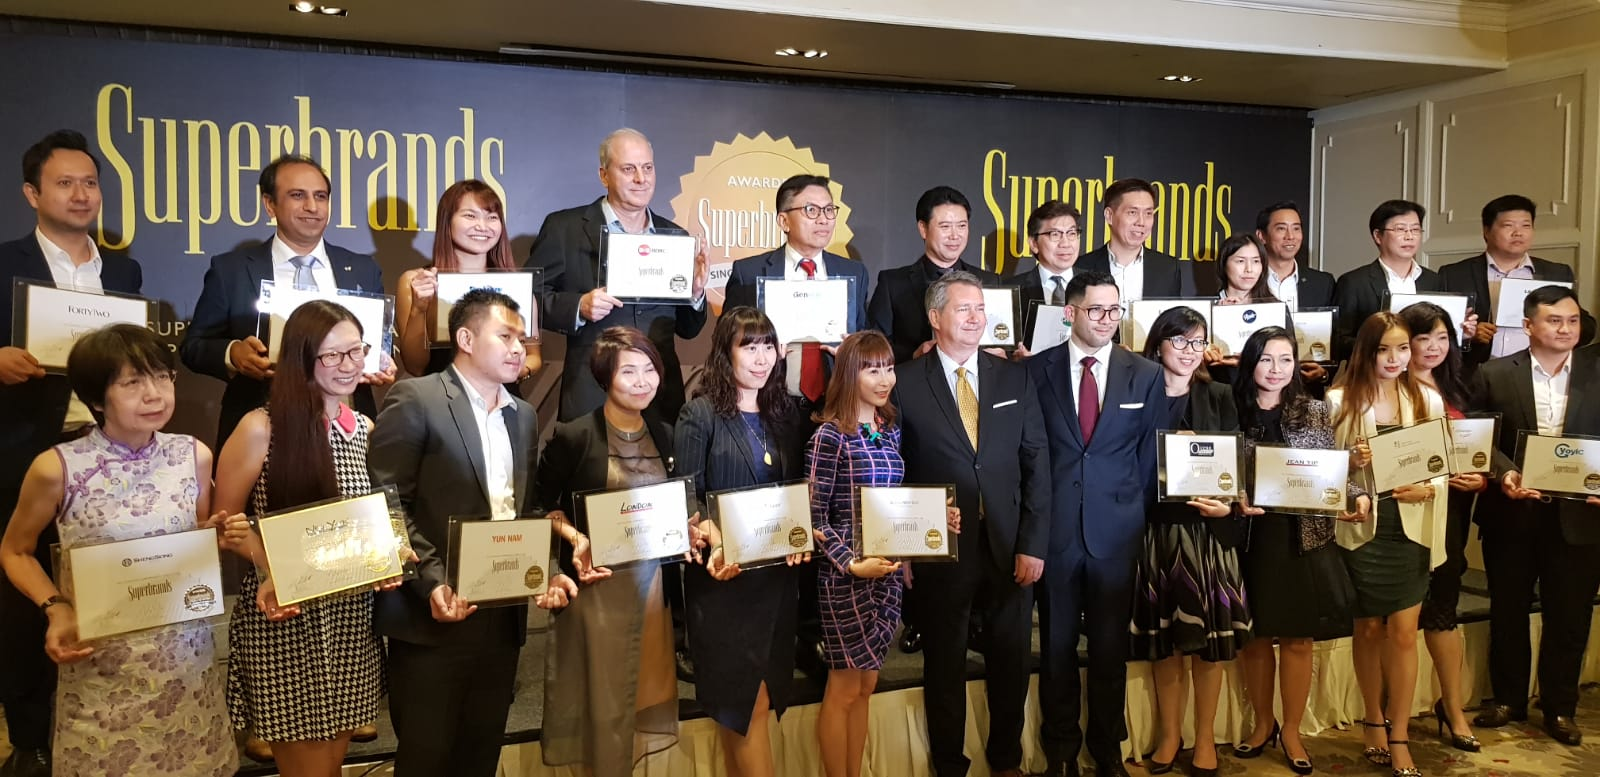 Winner of Superbrands Award since 2010